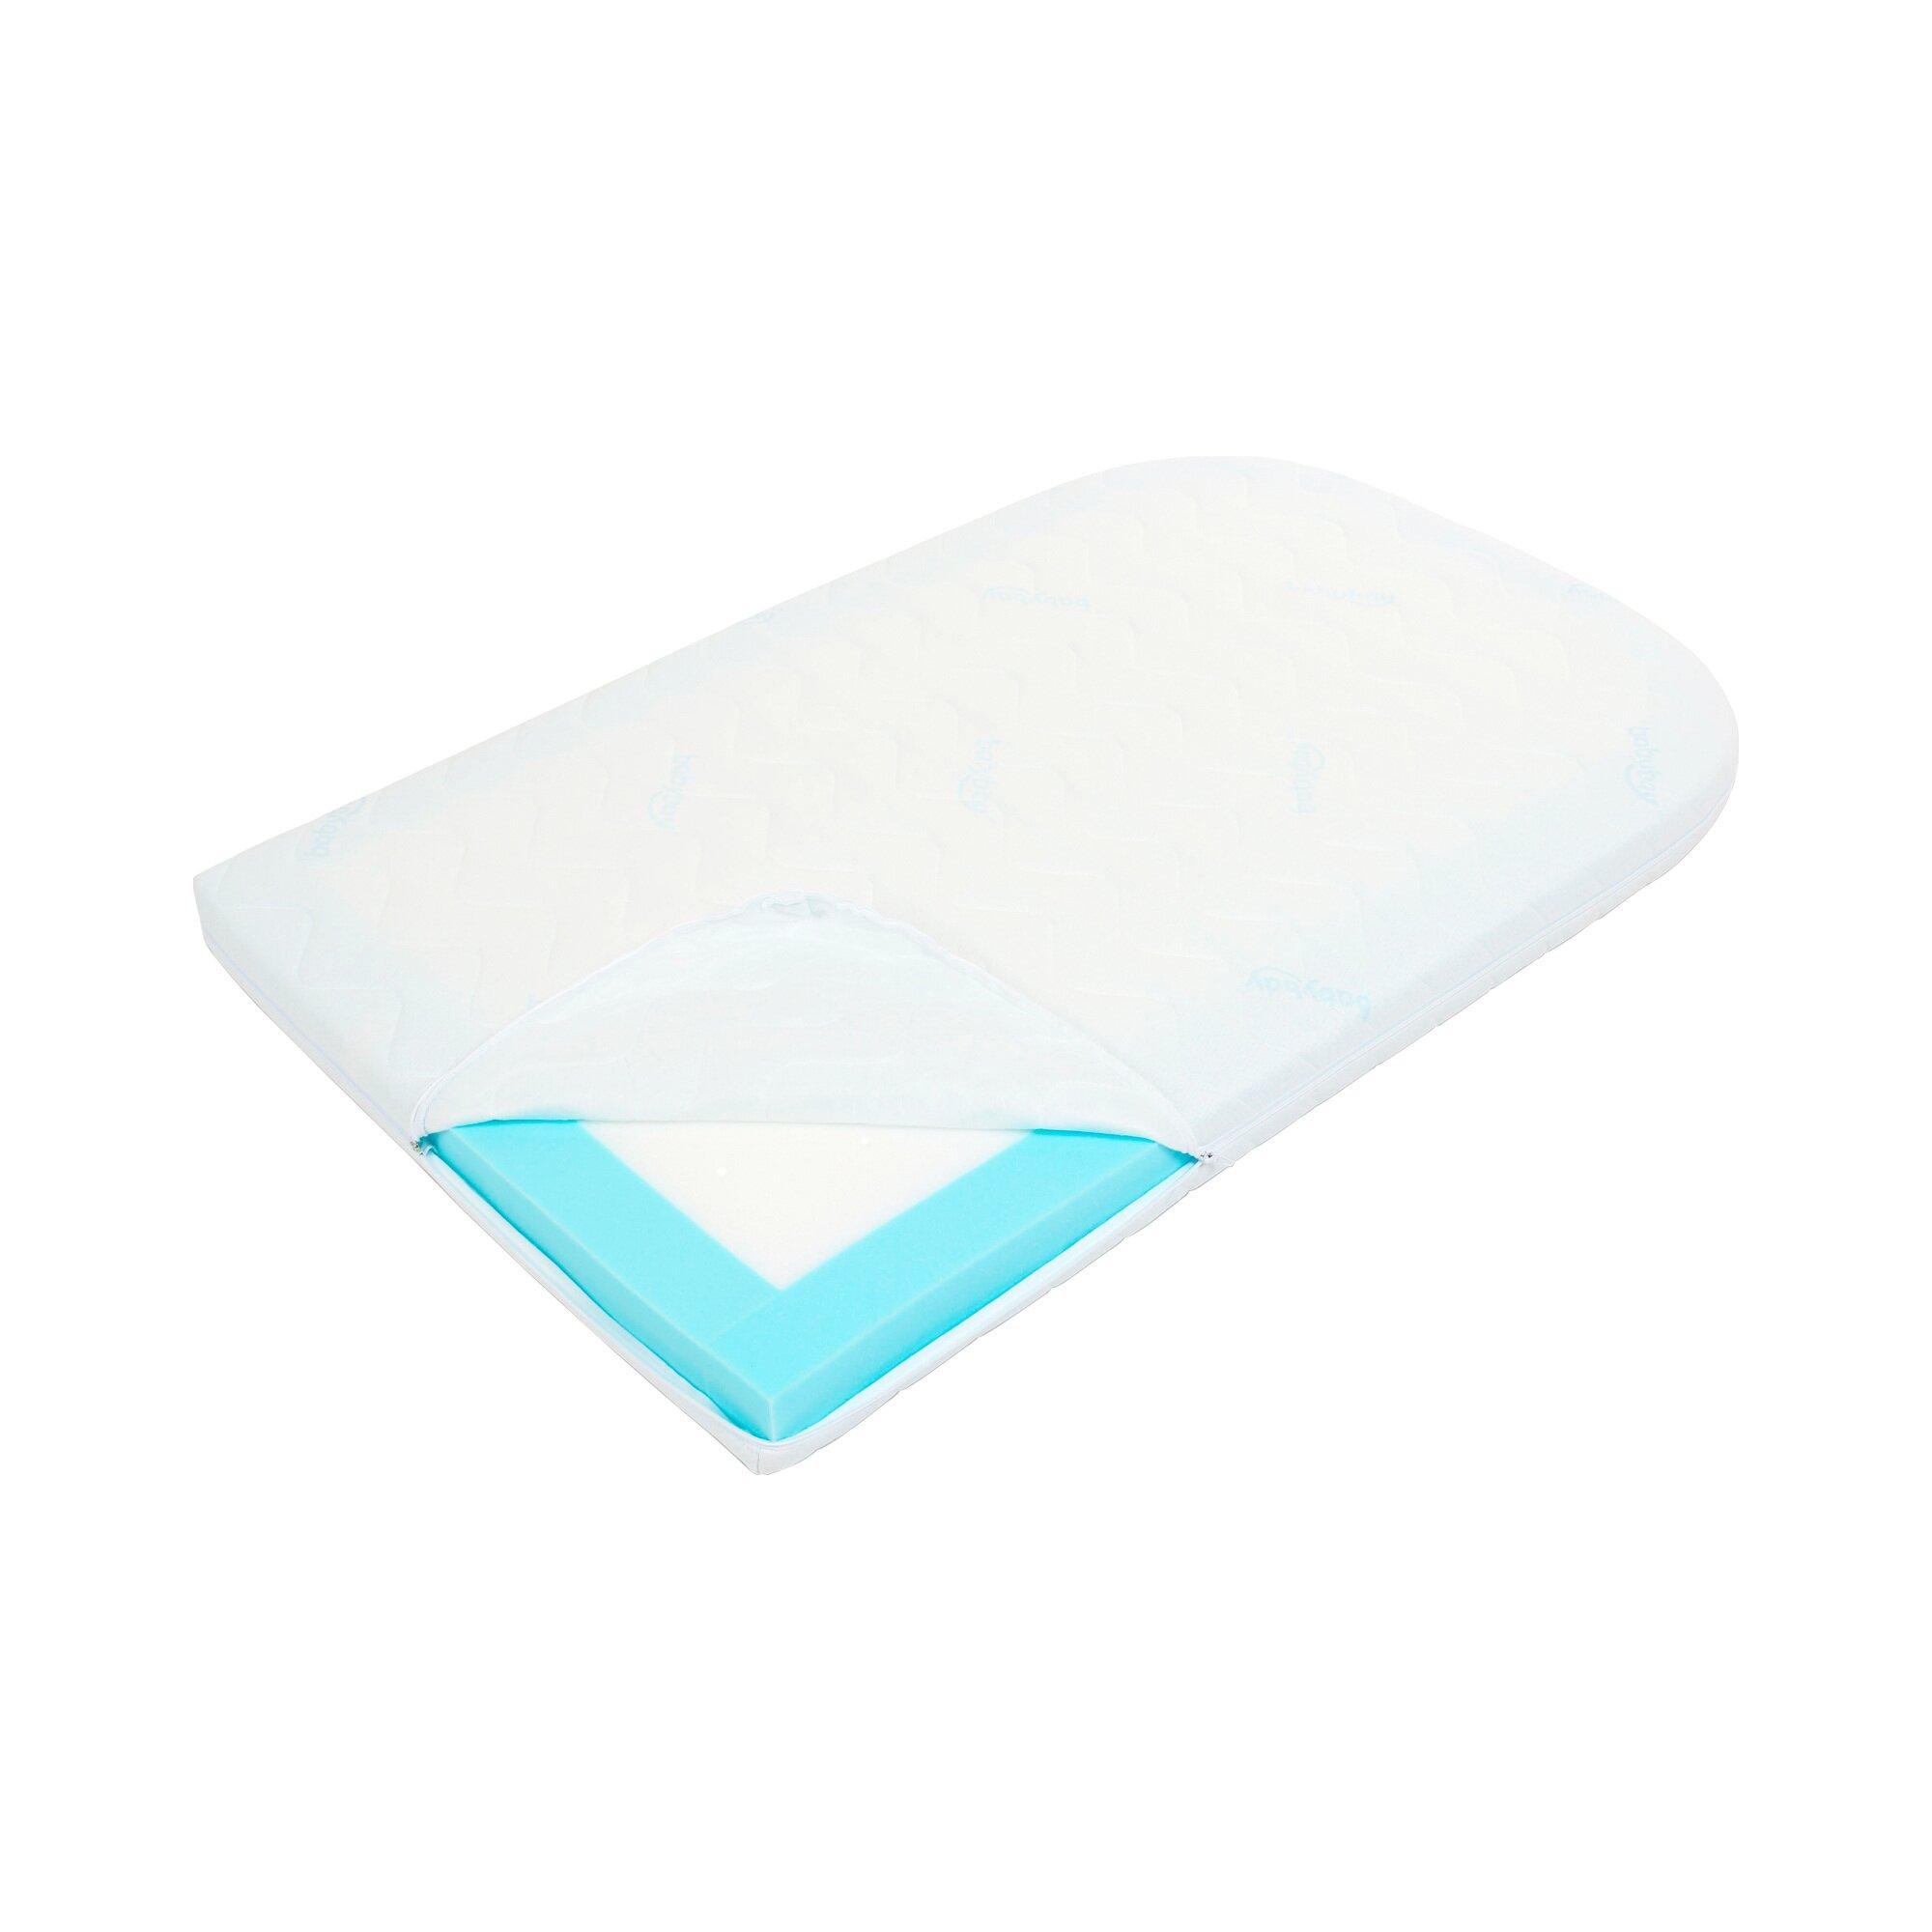 Babybay® Matratze Medicott extraluftig für Umbausatz Maxi